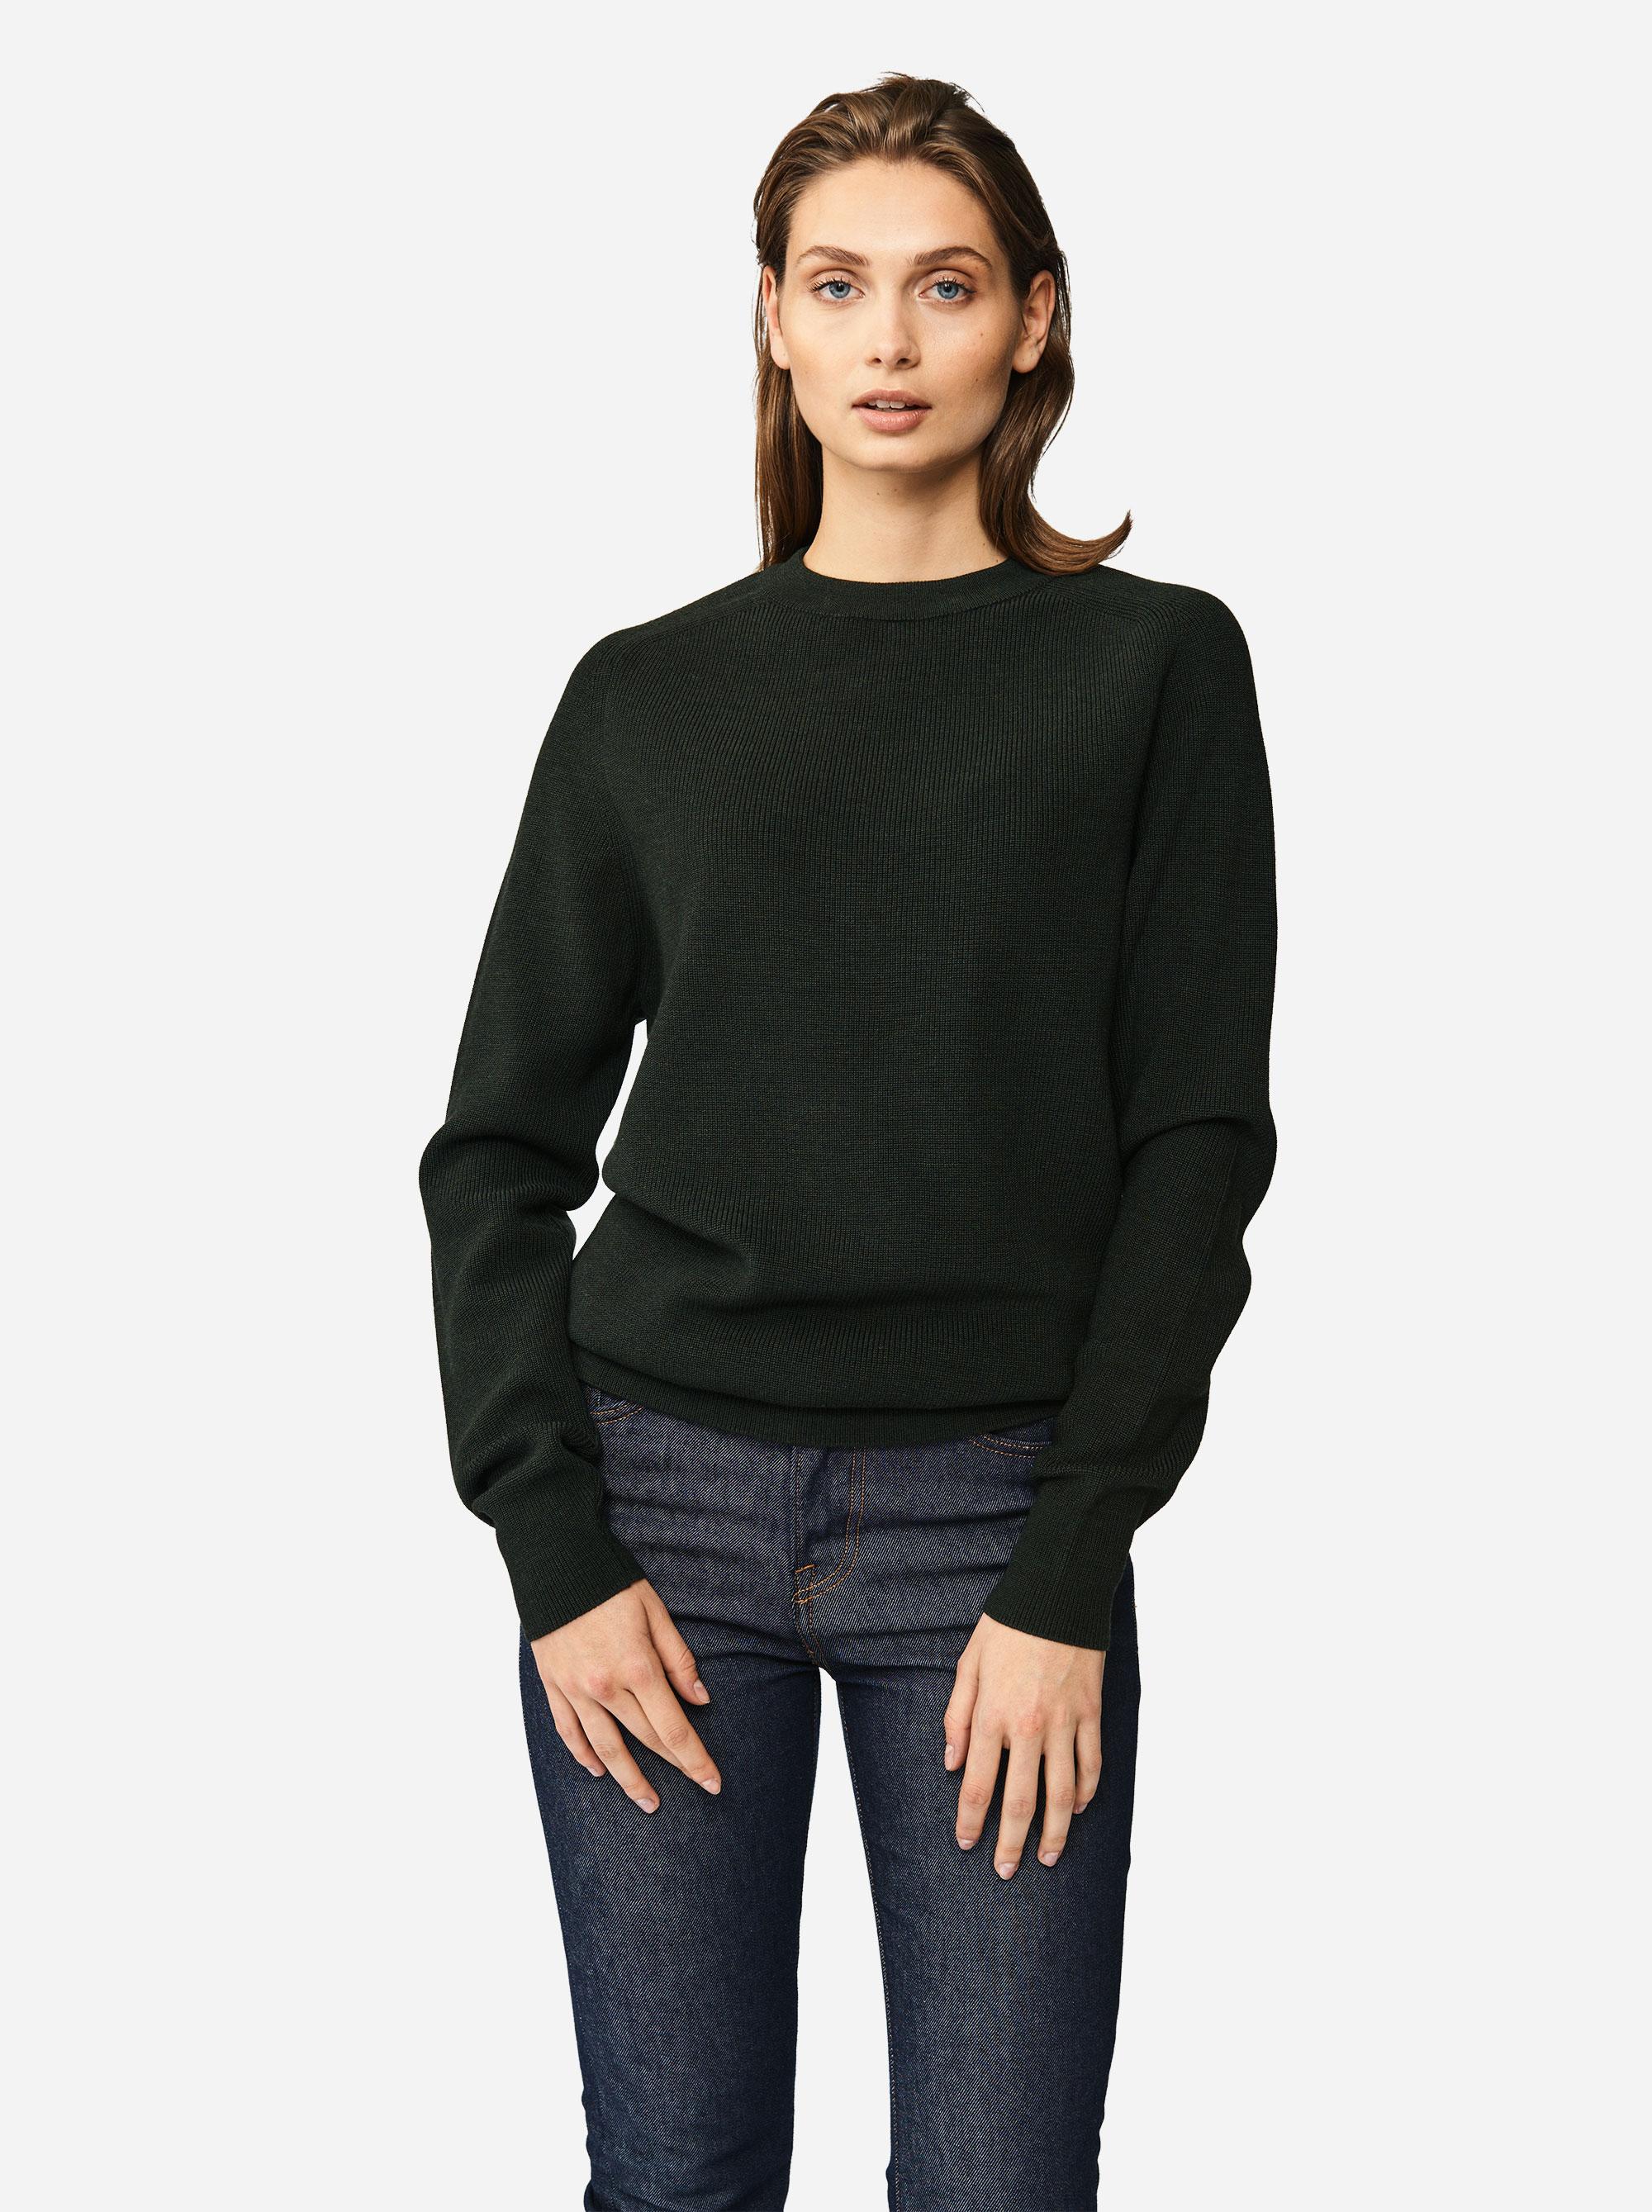 Teym - Crewneck - The Merino Sweater - Women - Green - 3